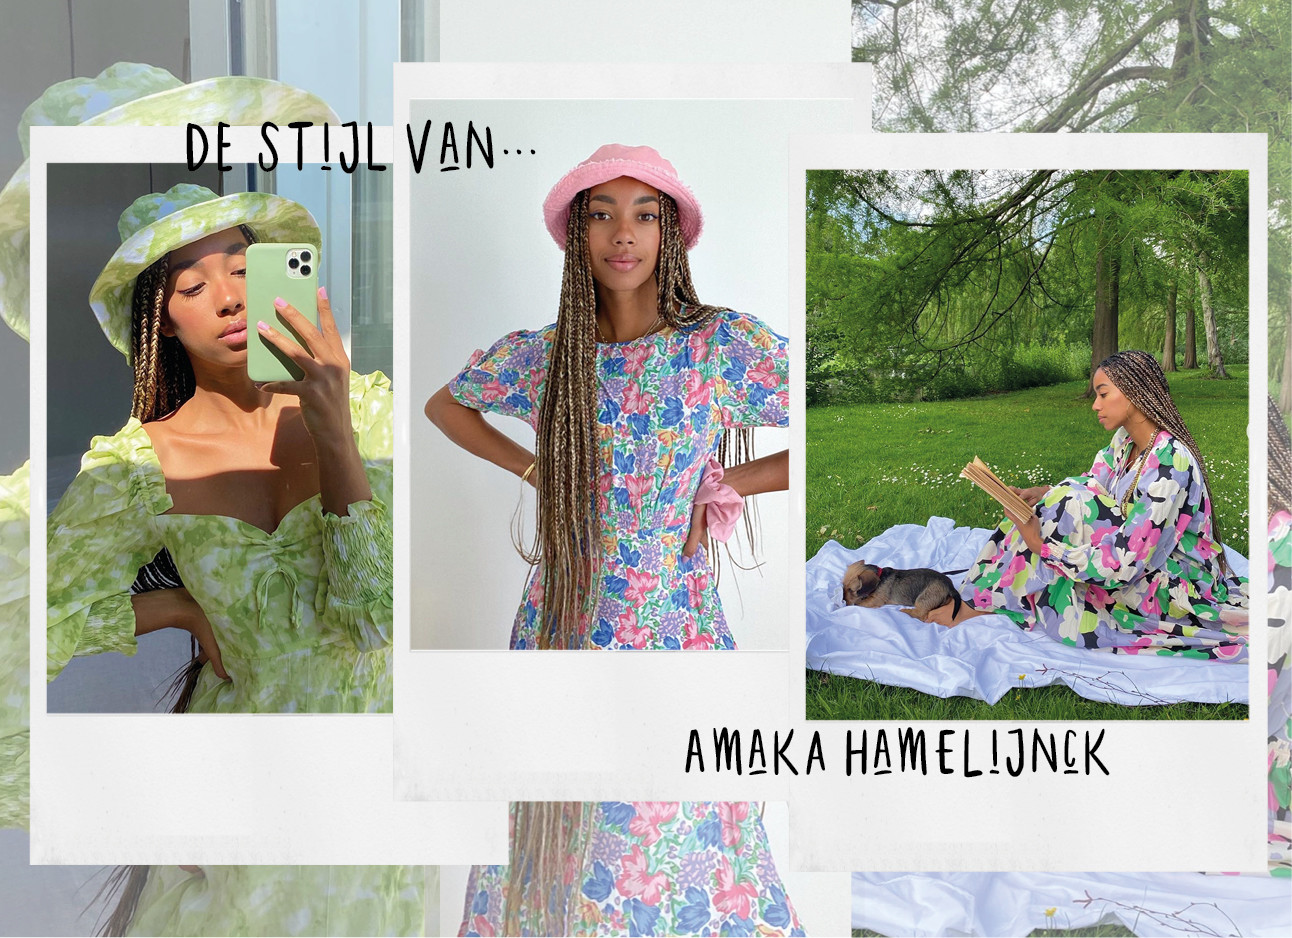 Amaka Hamelijnck